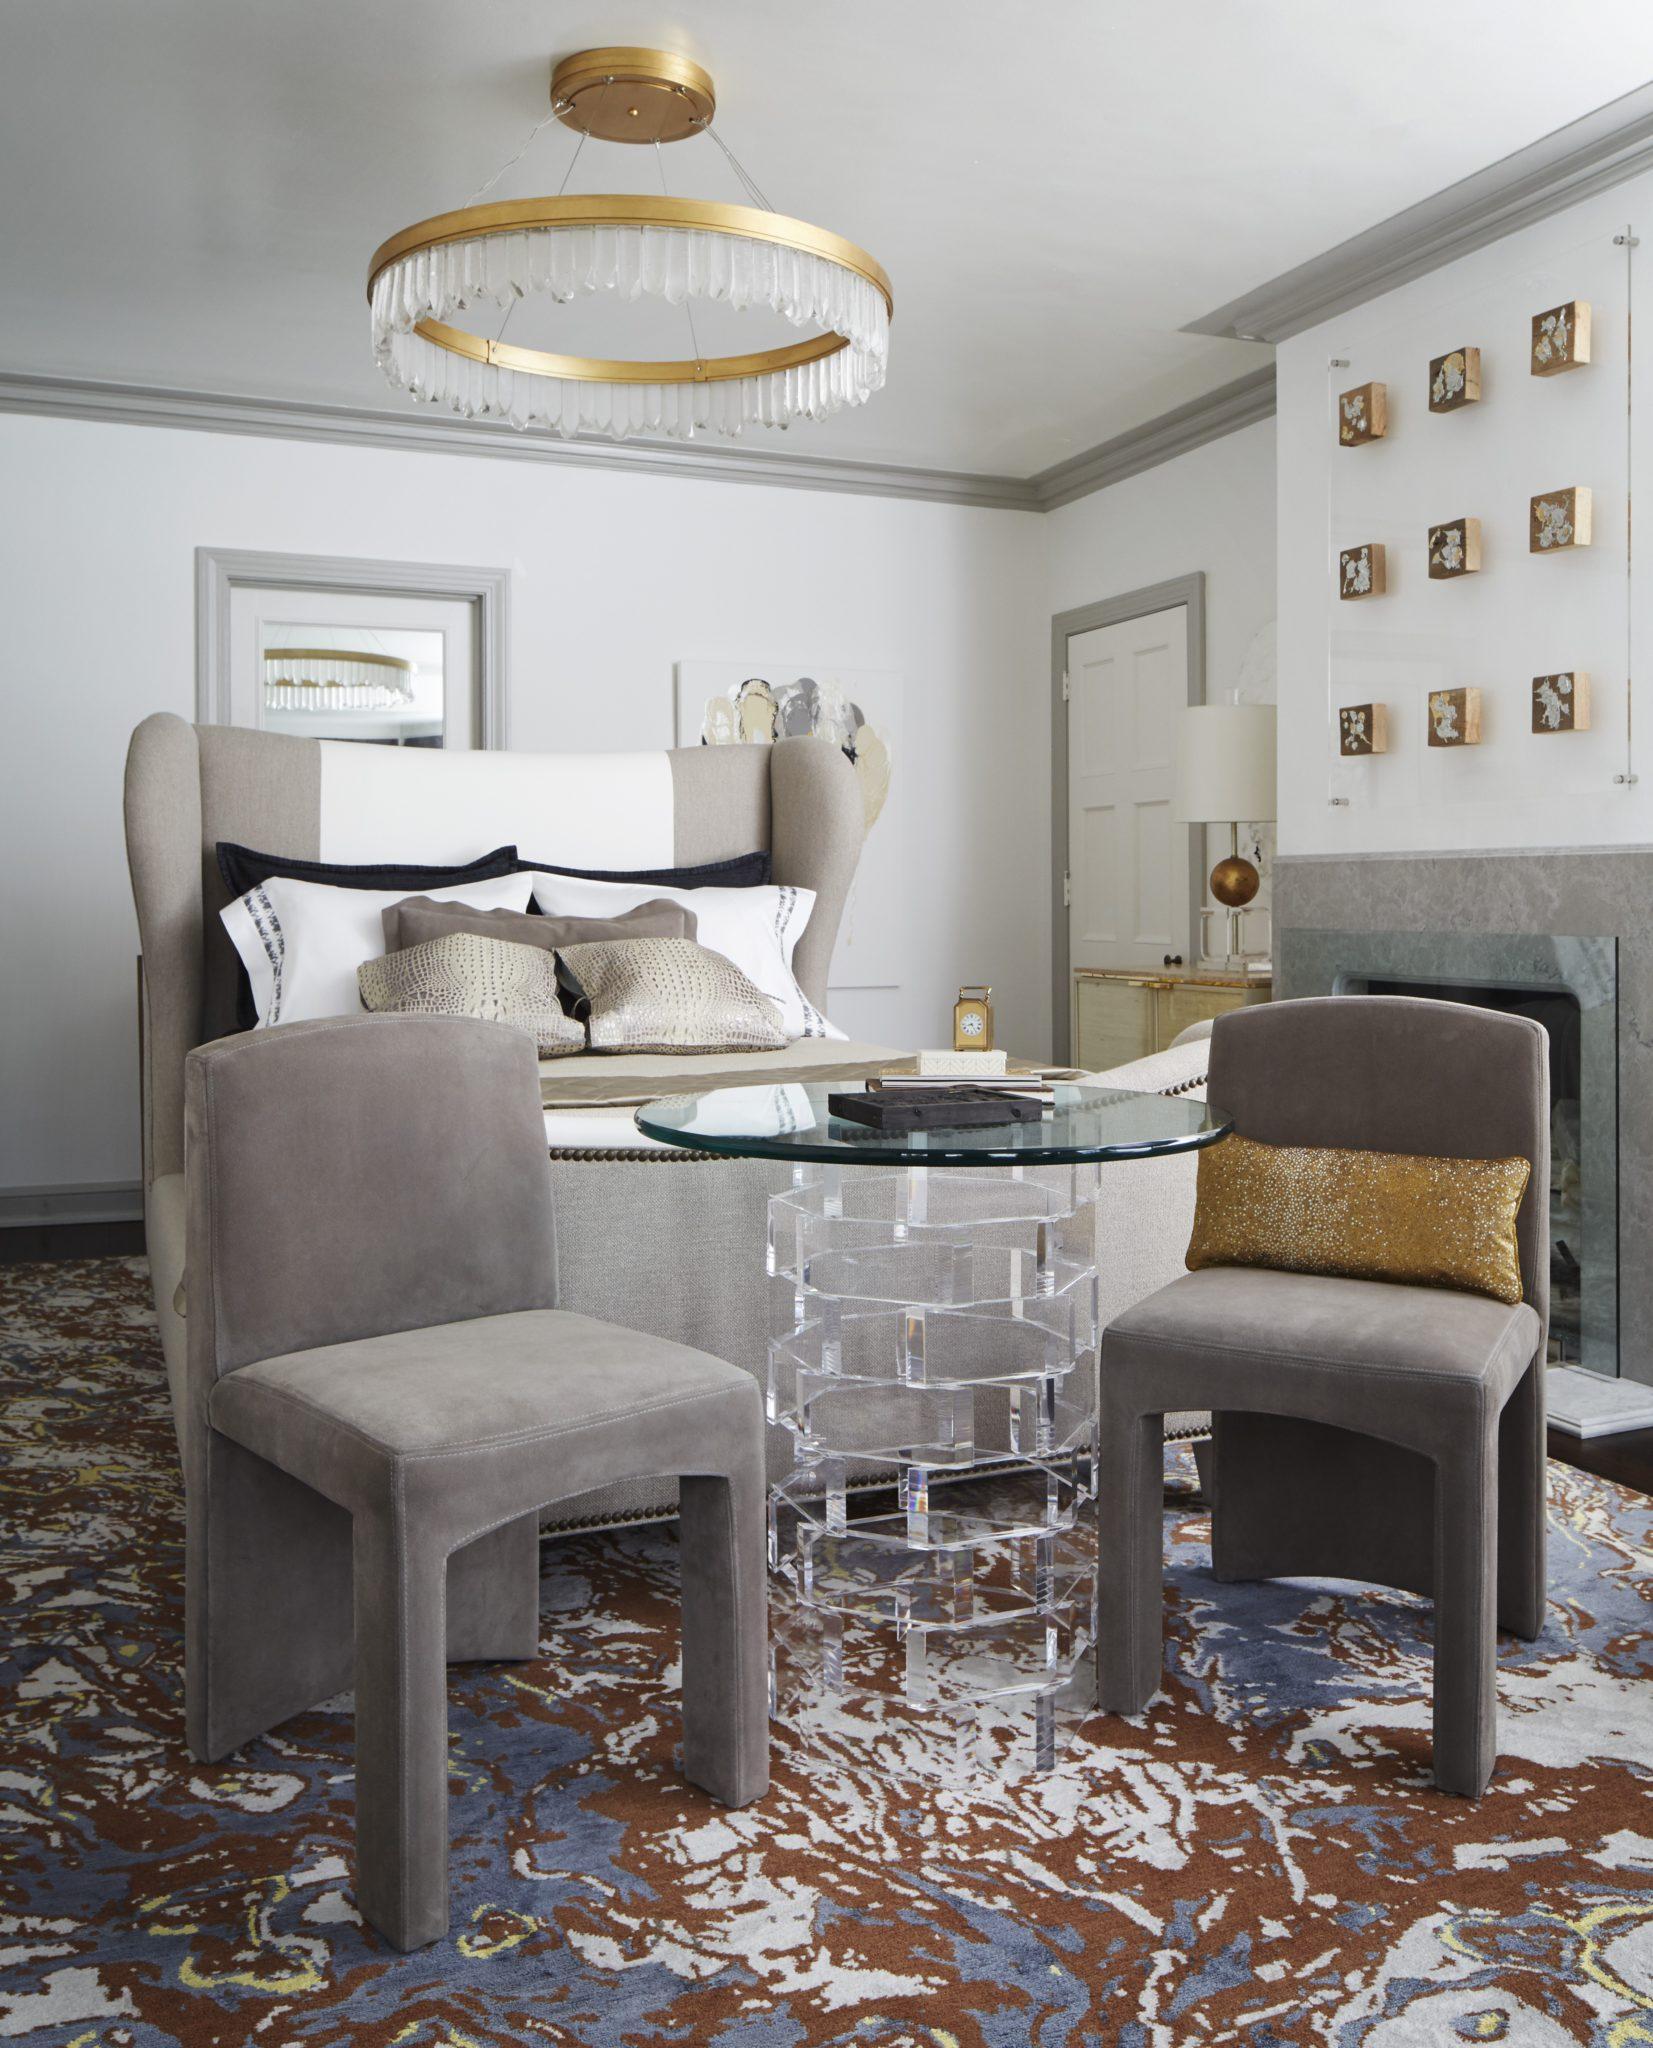 Master bedroom by Sweet Peas Design